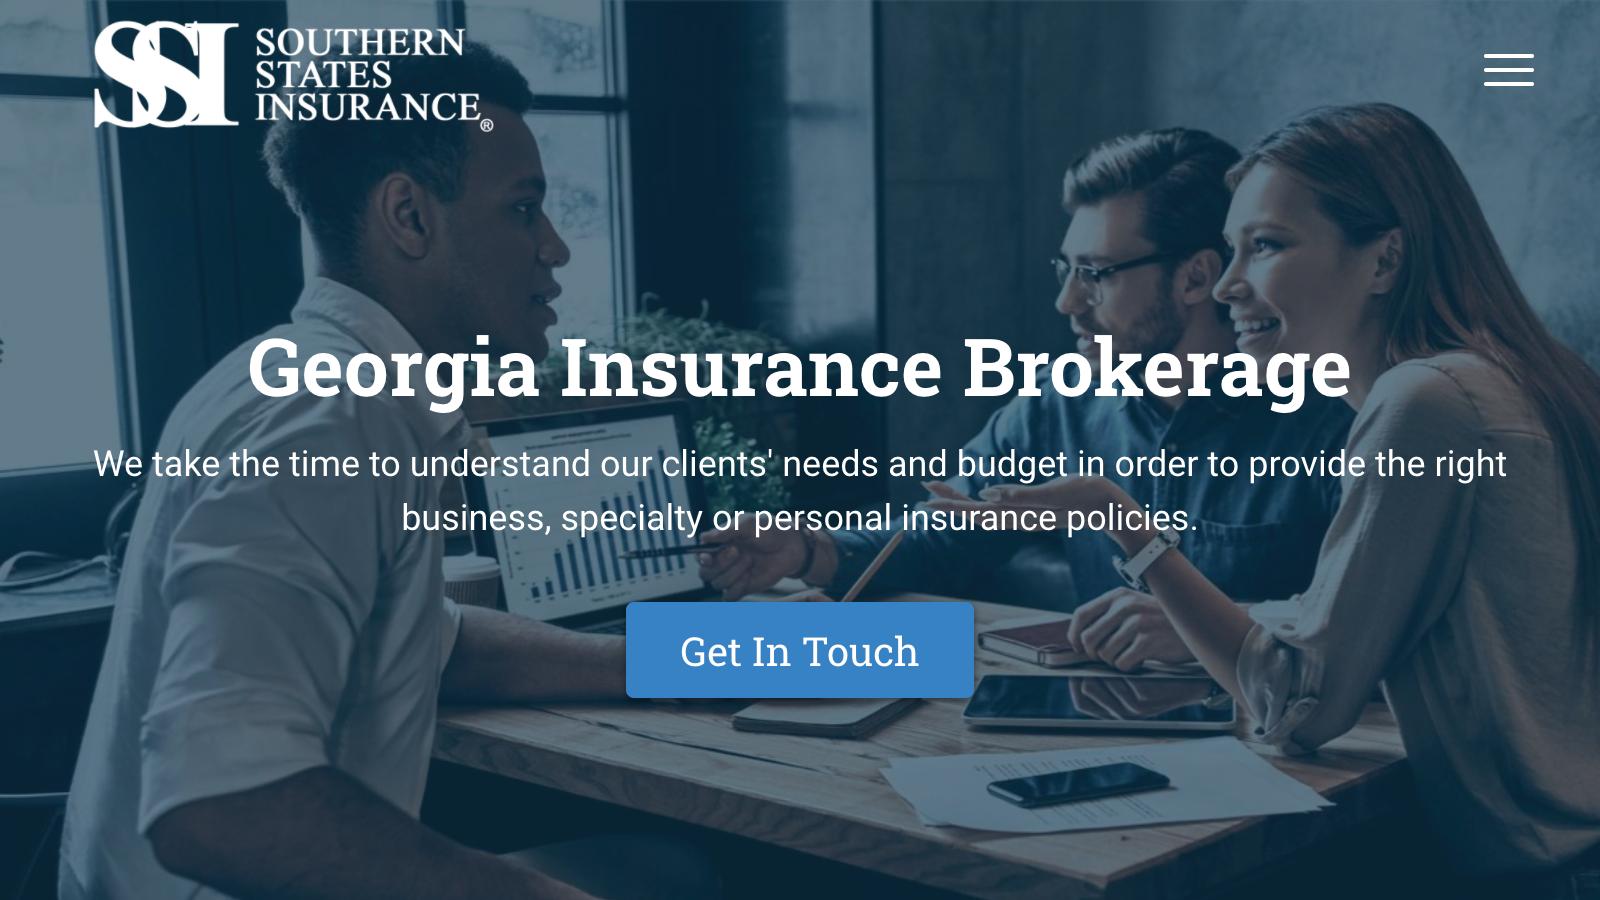 southern states insurance desktop